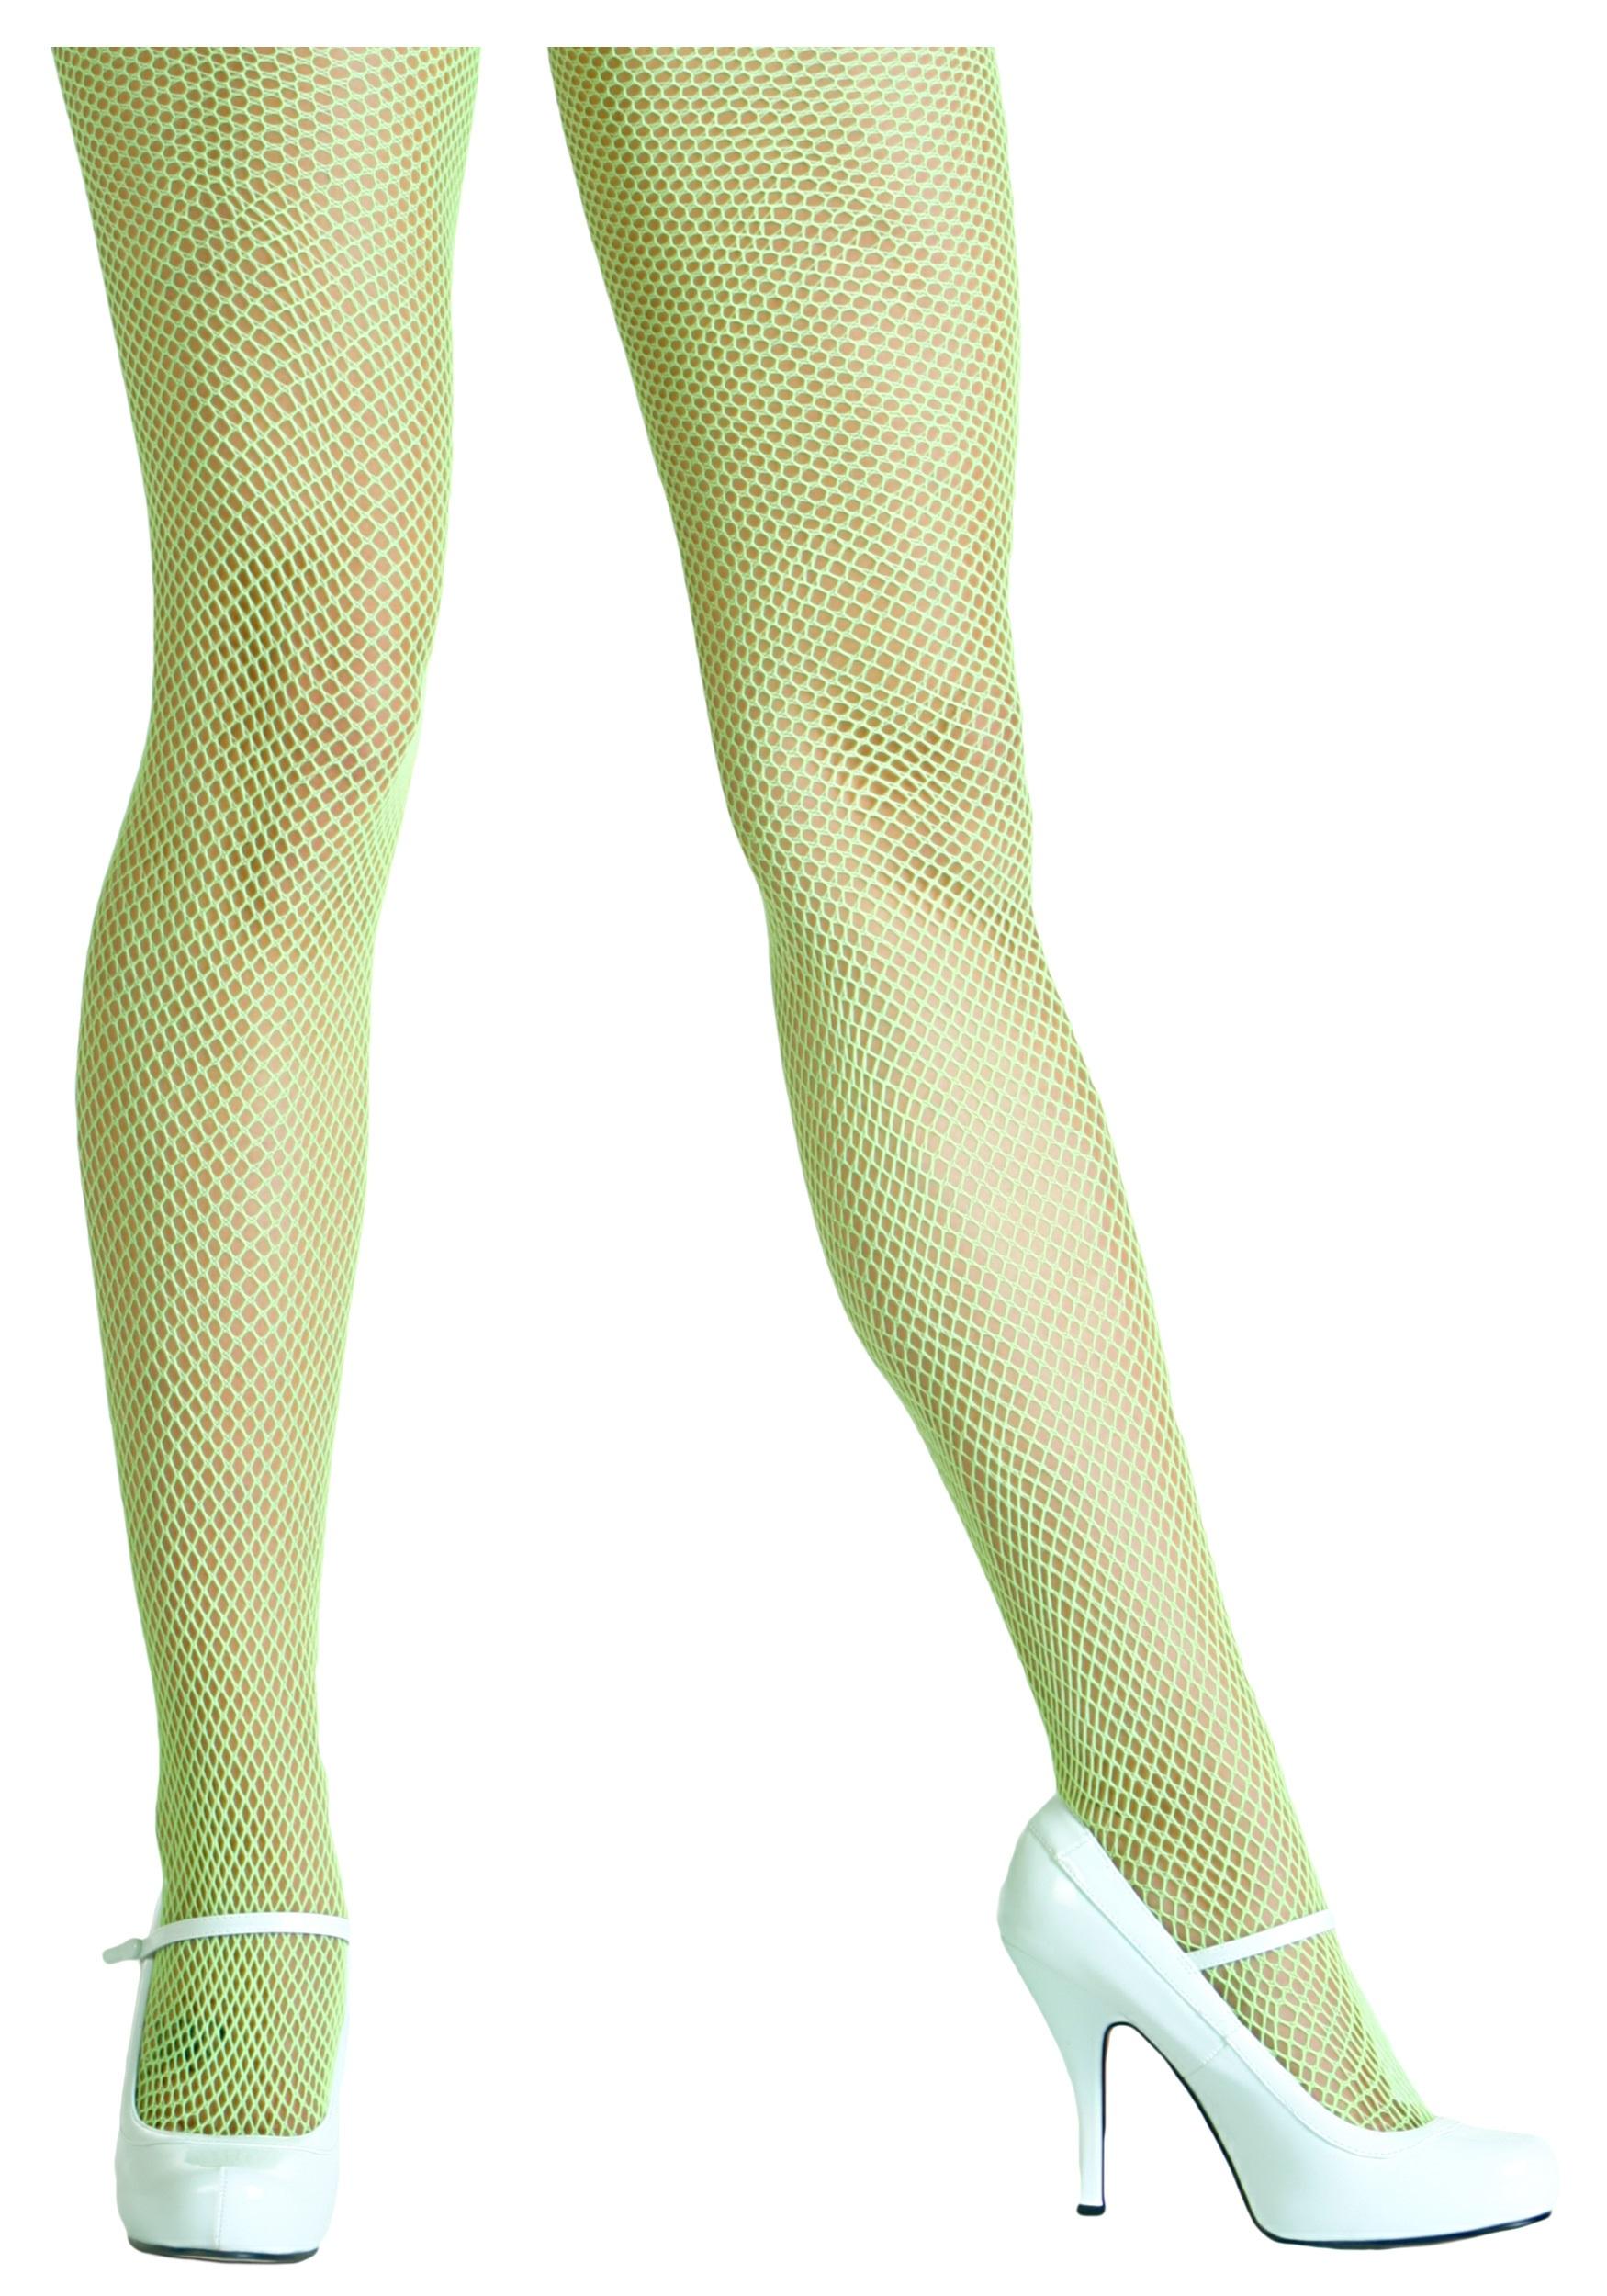 Green Fishnet Tights Neon Green Fishnet Tights